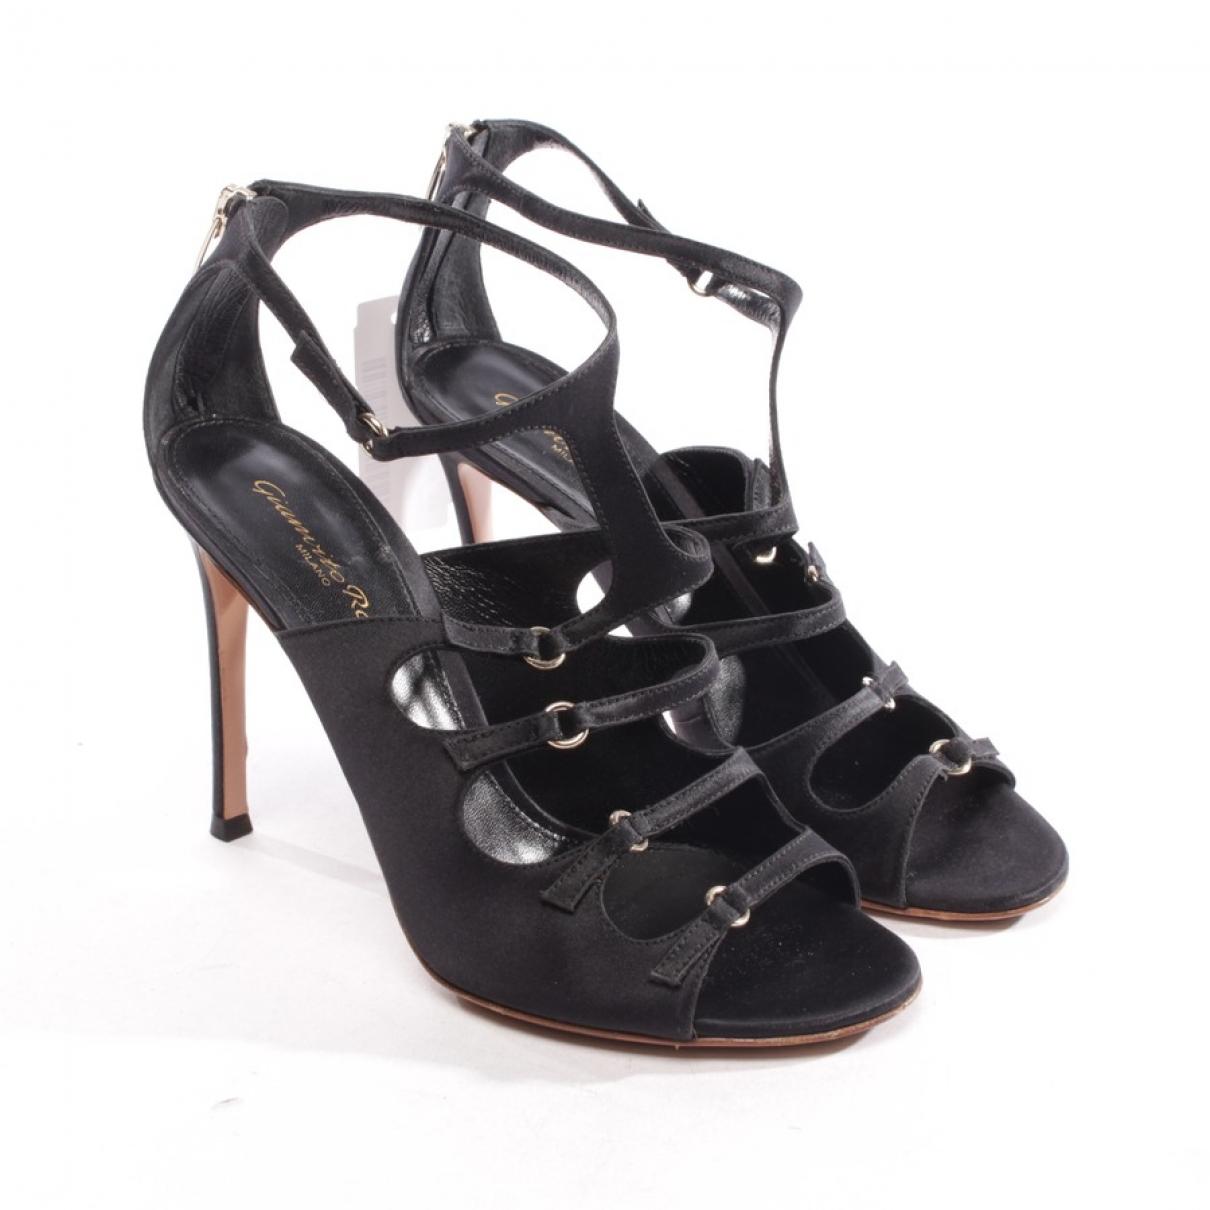 Gianvito Rossi \N Black Cloth Sandals for Women 37.5 EU